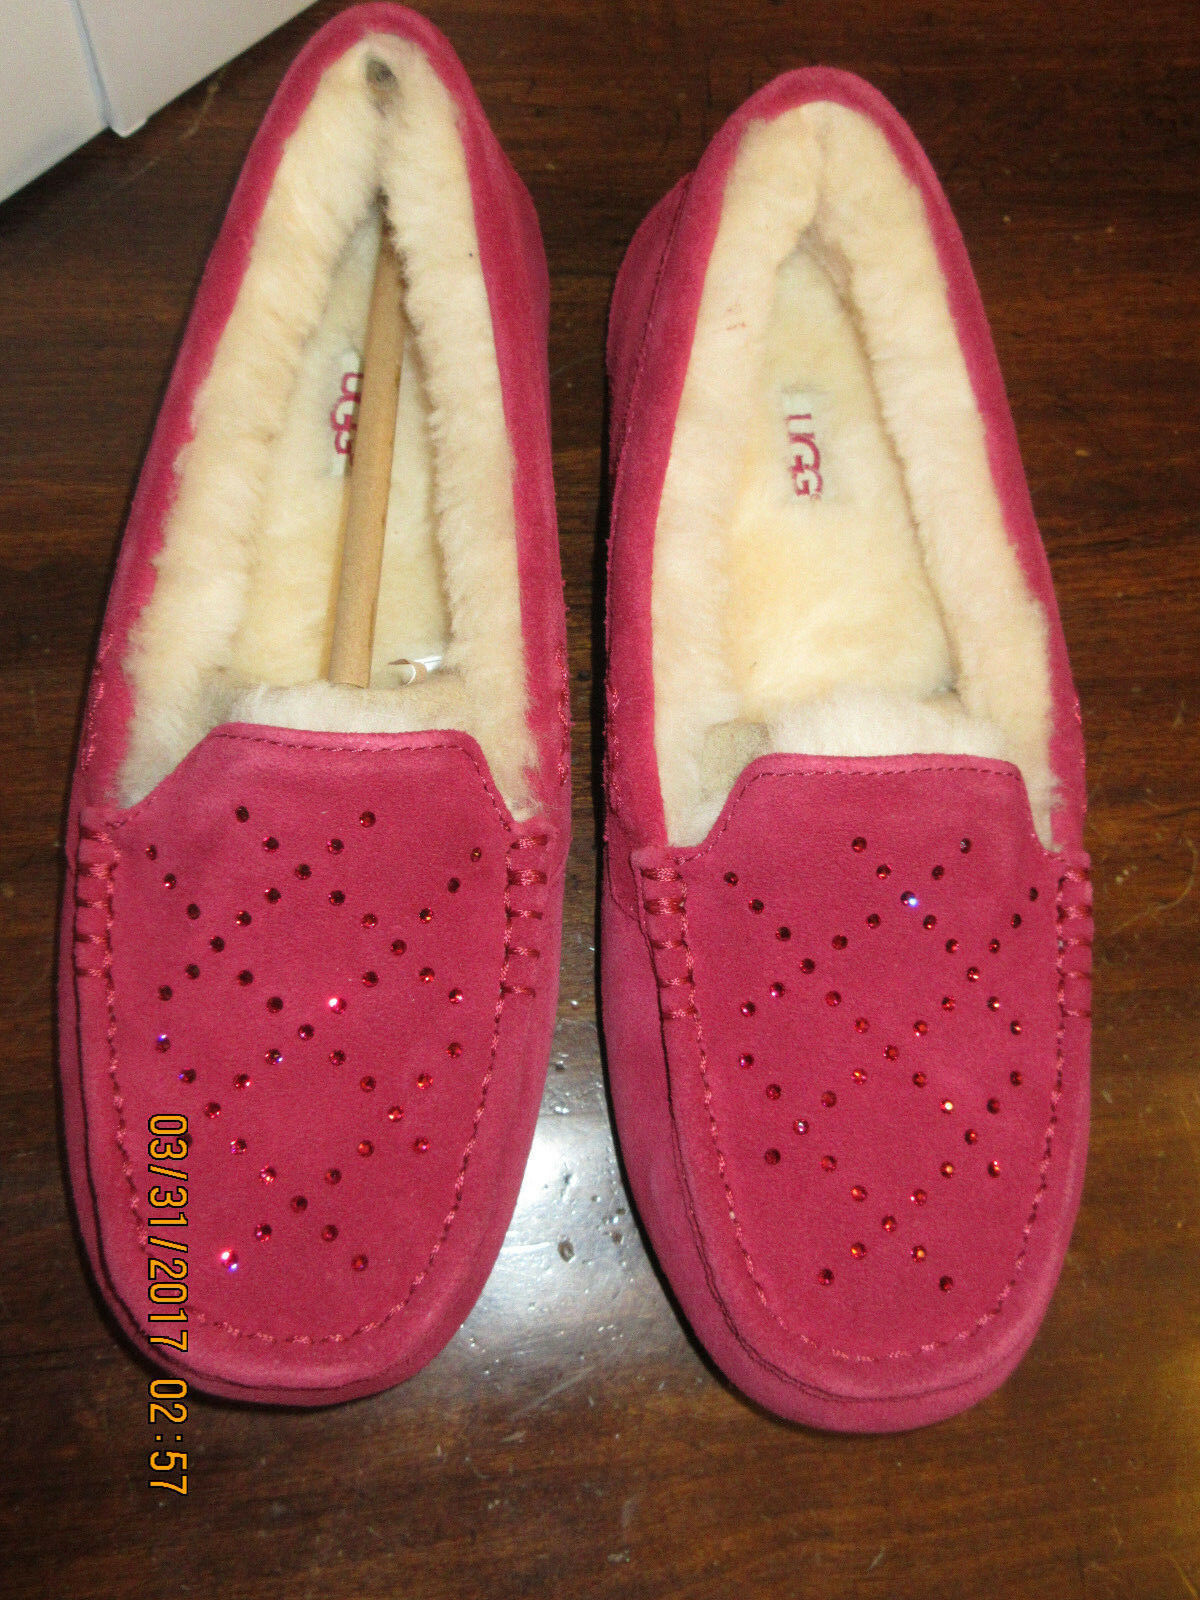 Ugg Australia Ansley Kristall Diamond Oxblood Pink Red Größe 5 1012885HBX